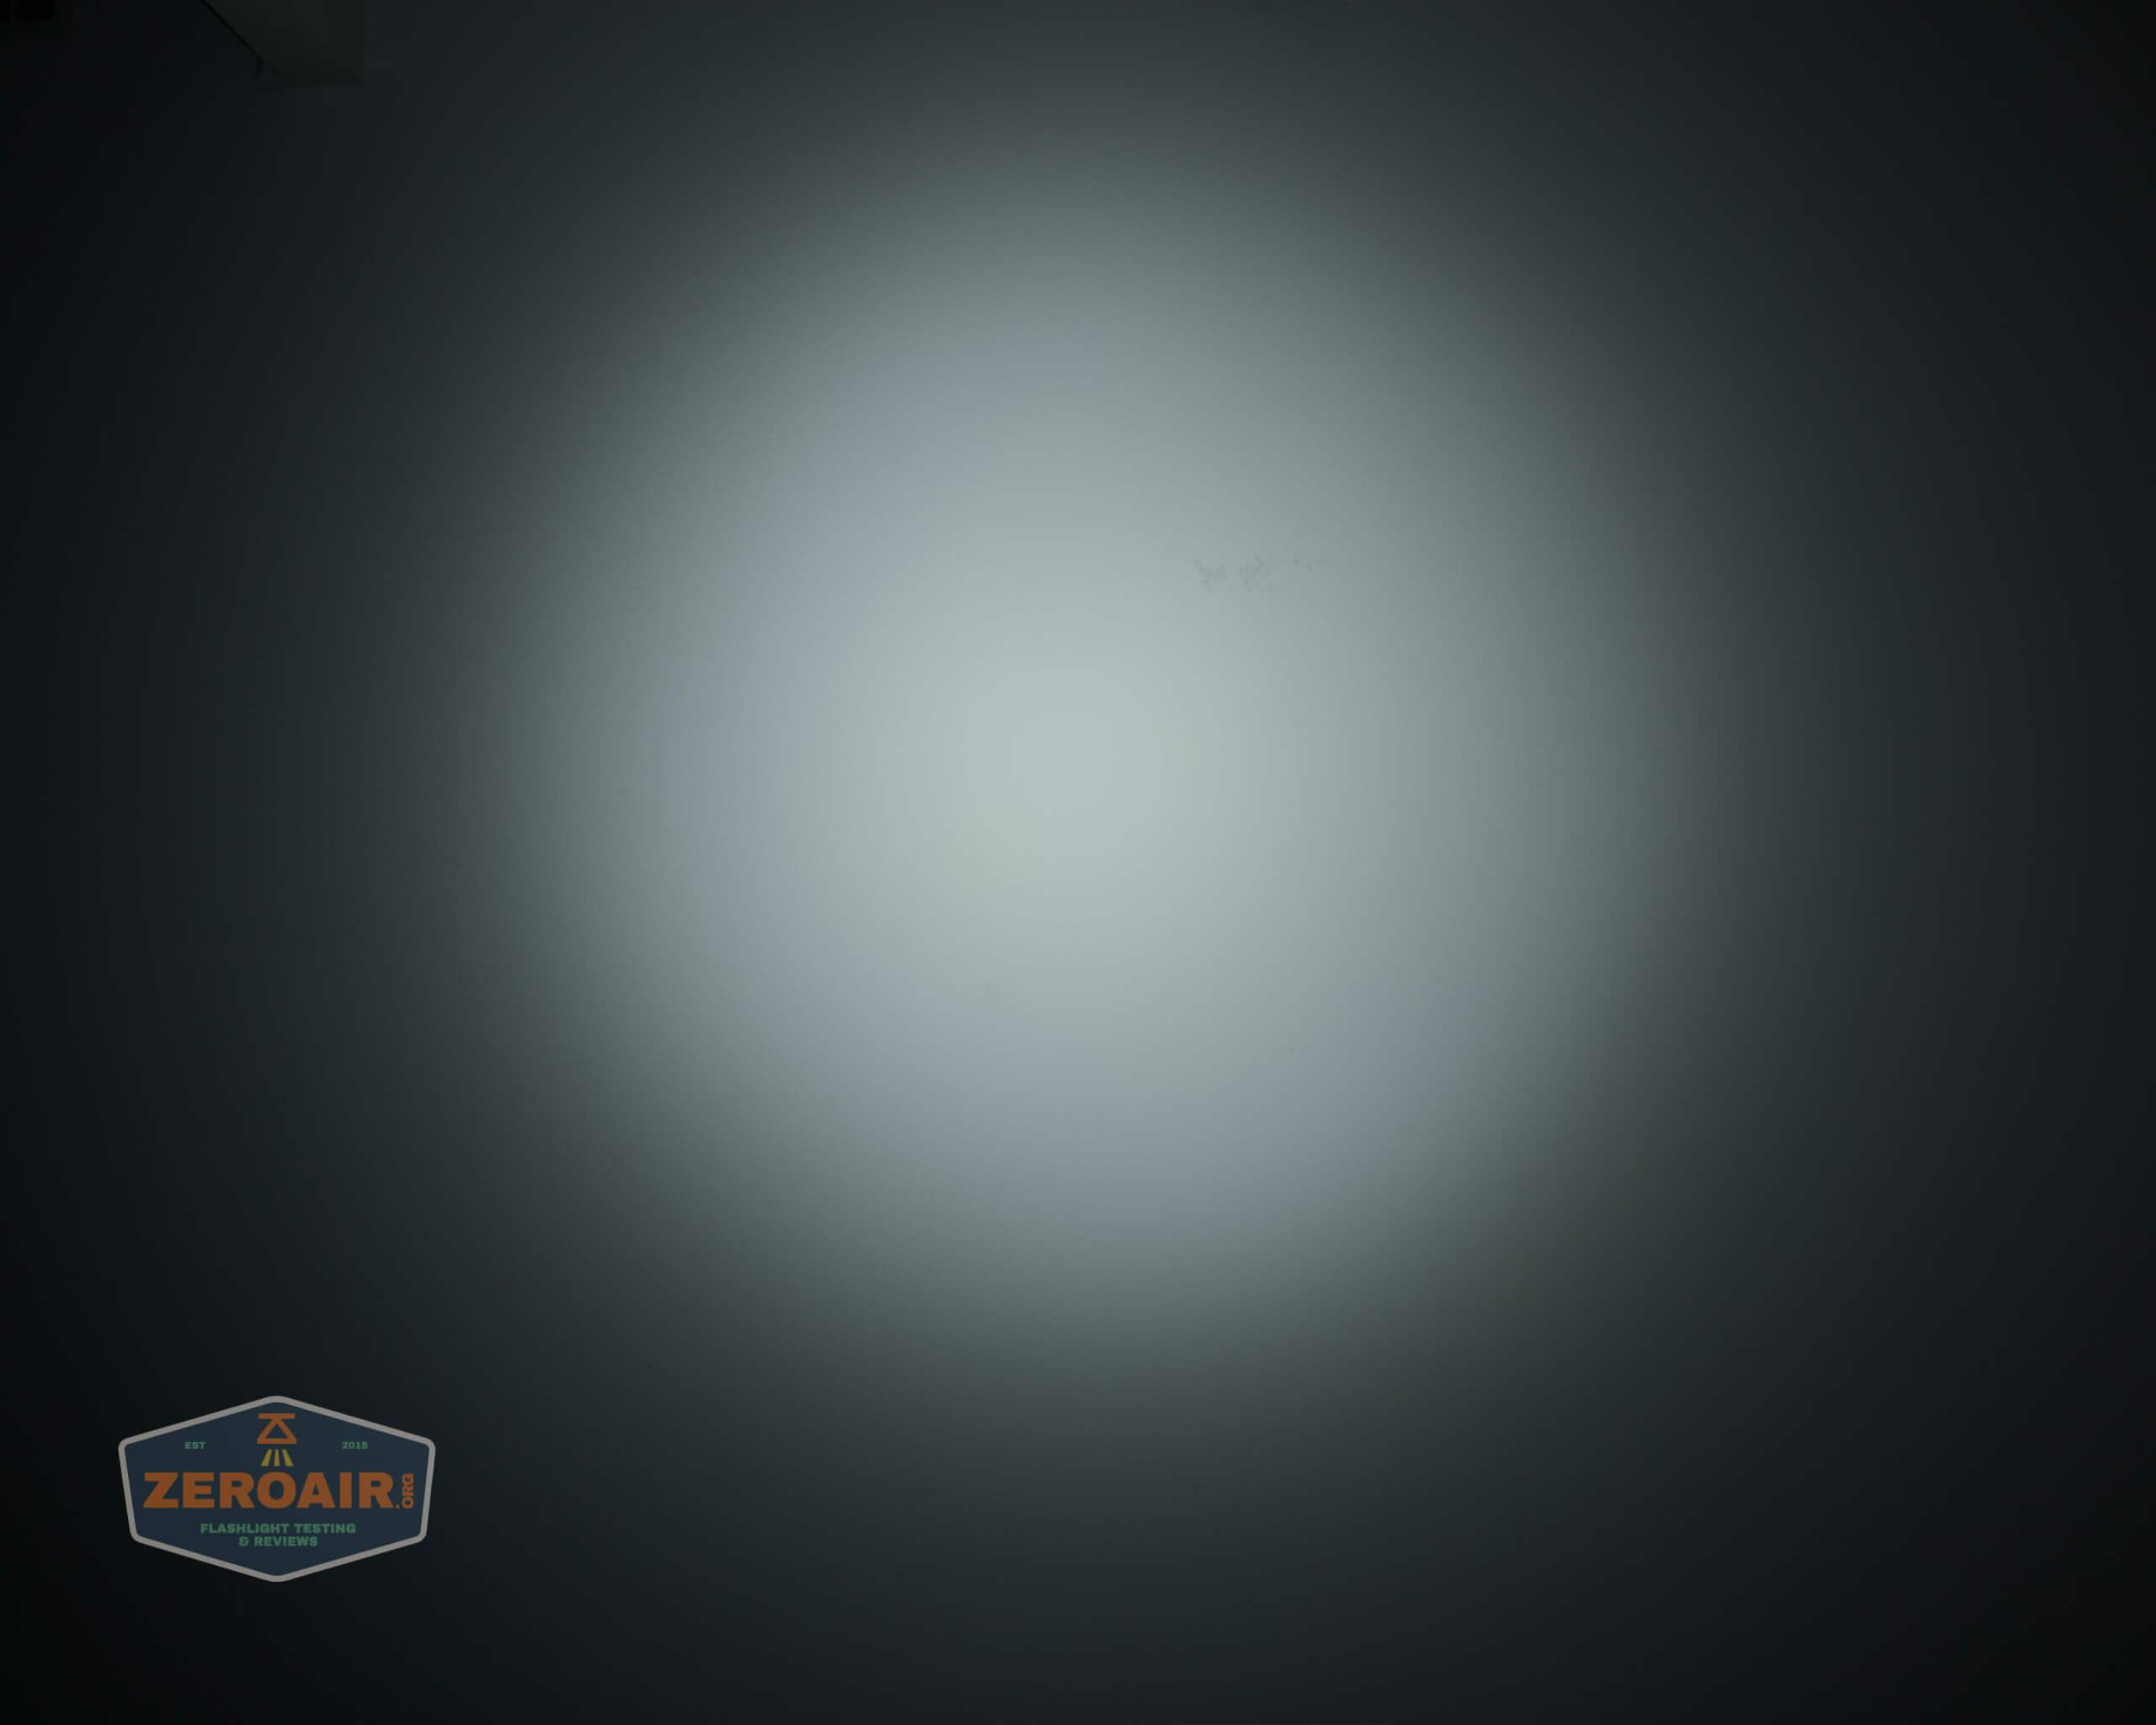 olight perun 2 21700 headlamp orange beamshot ceiling 4